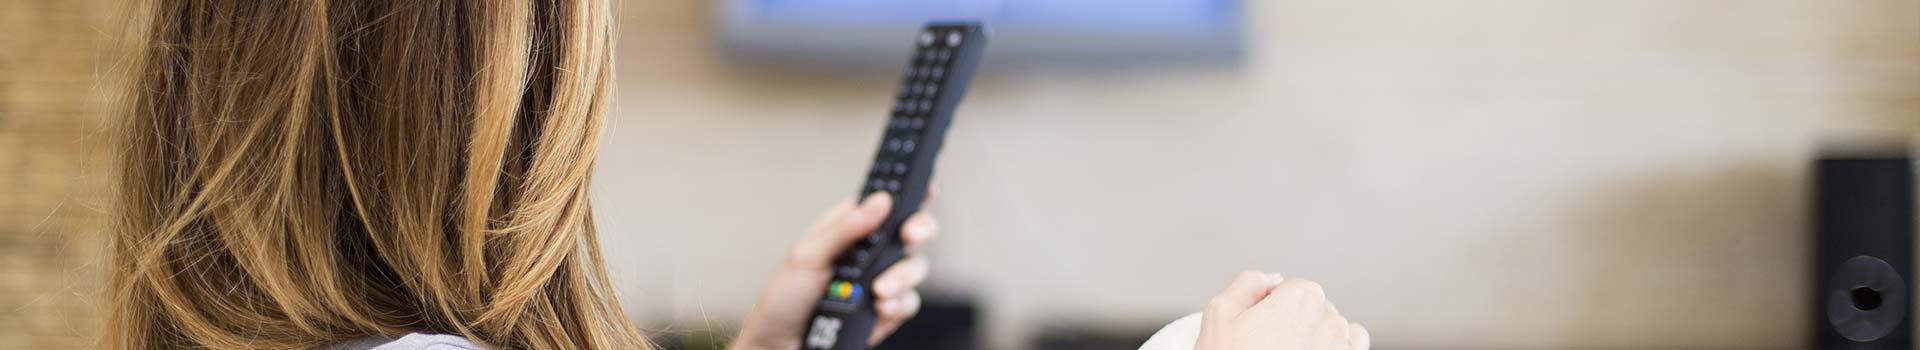 TV kijken via Glasvezel